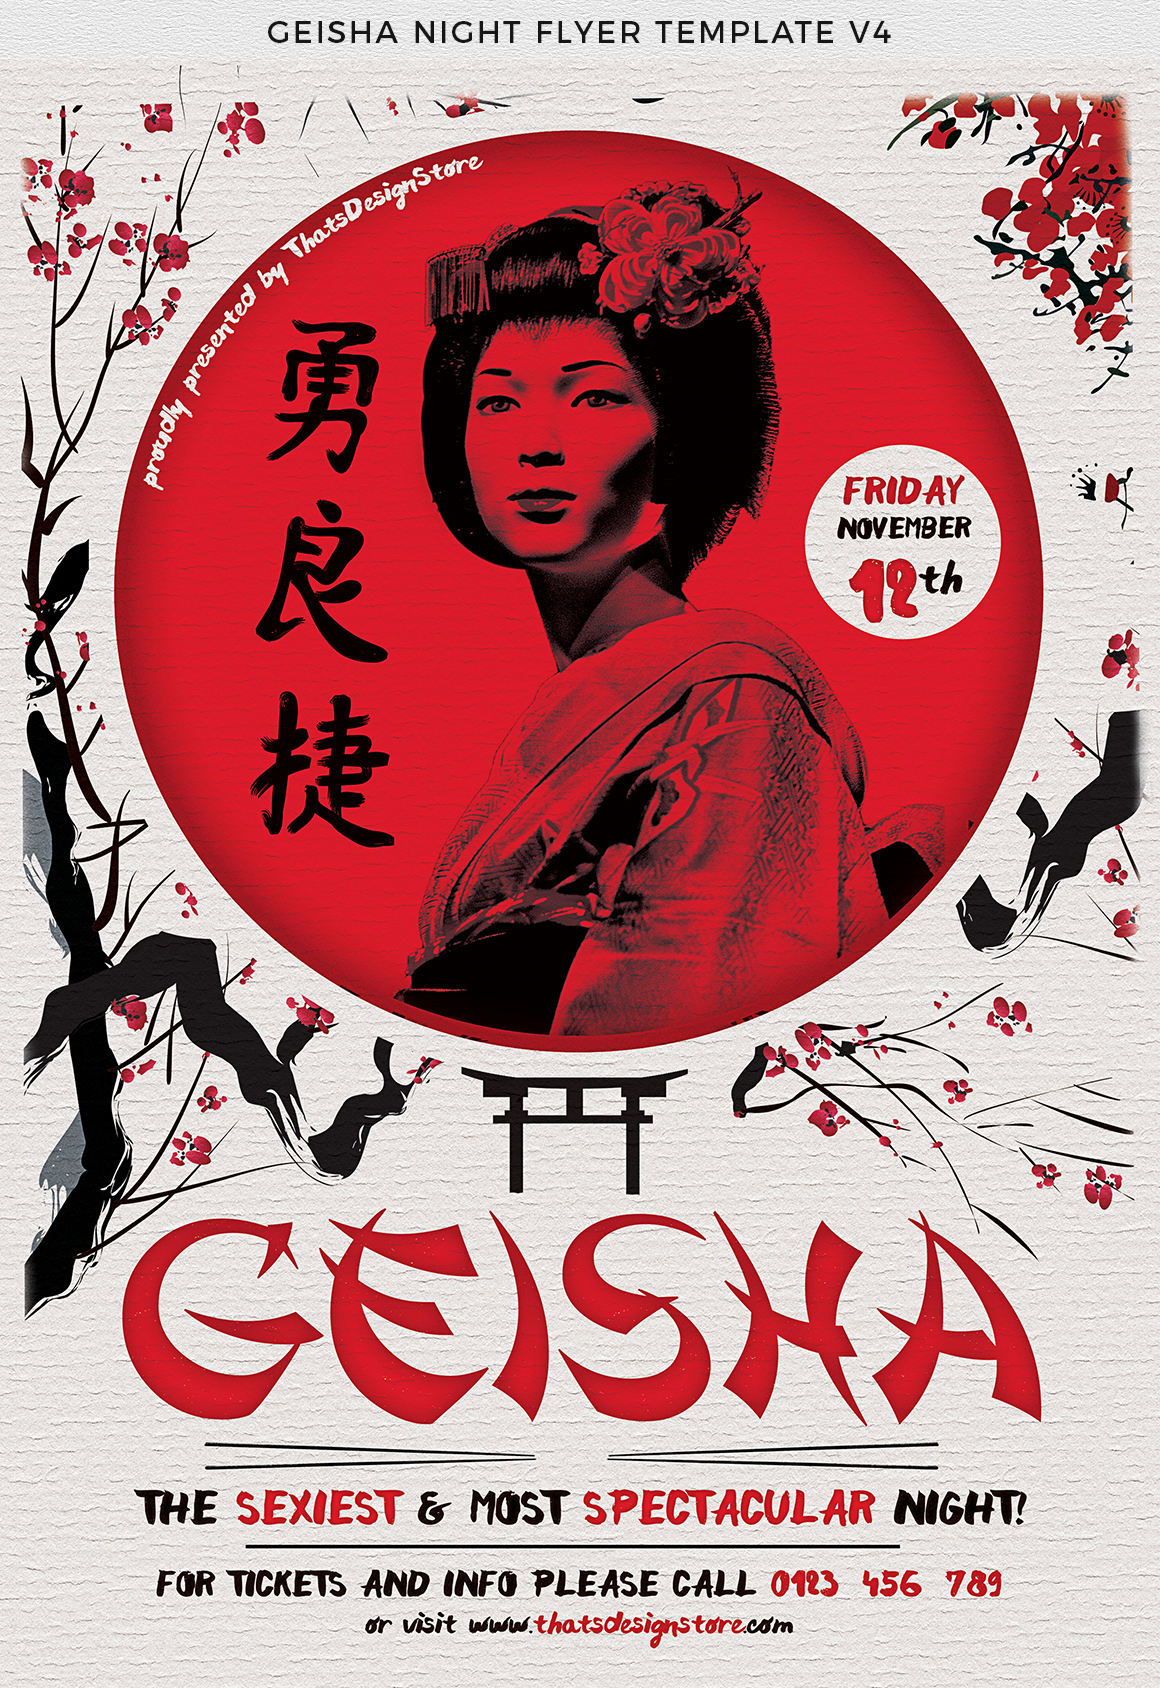 Geisha Night Flyer Template V4  example image 7